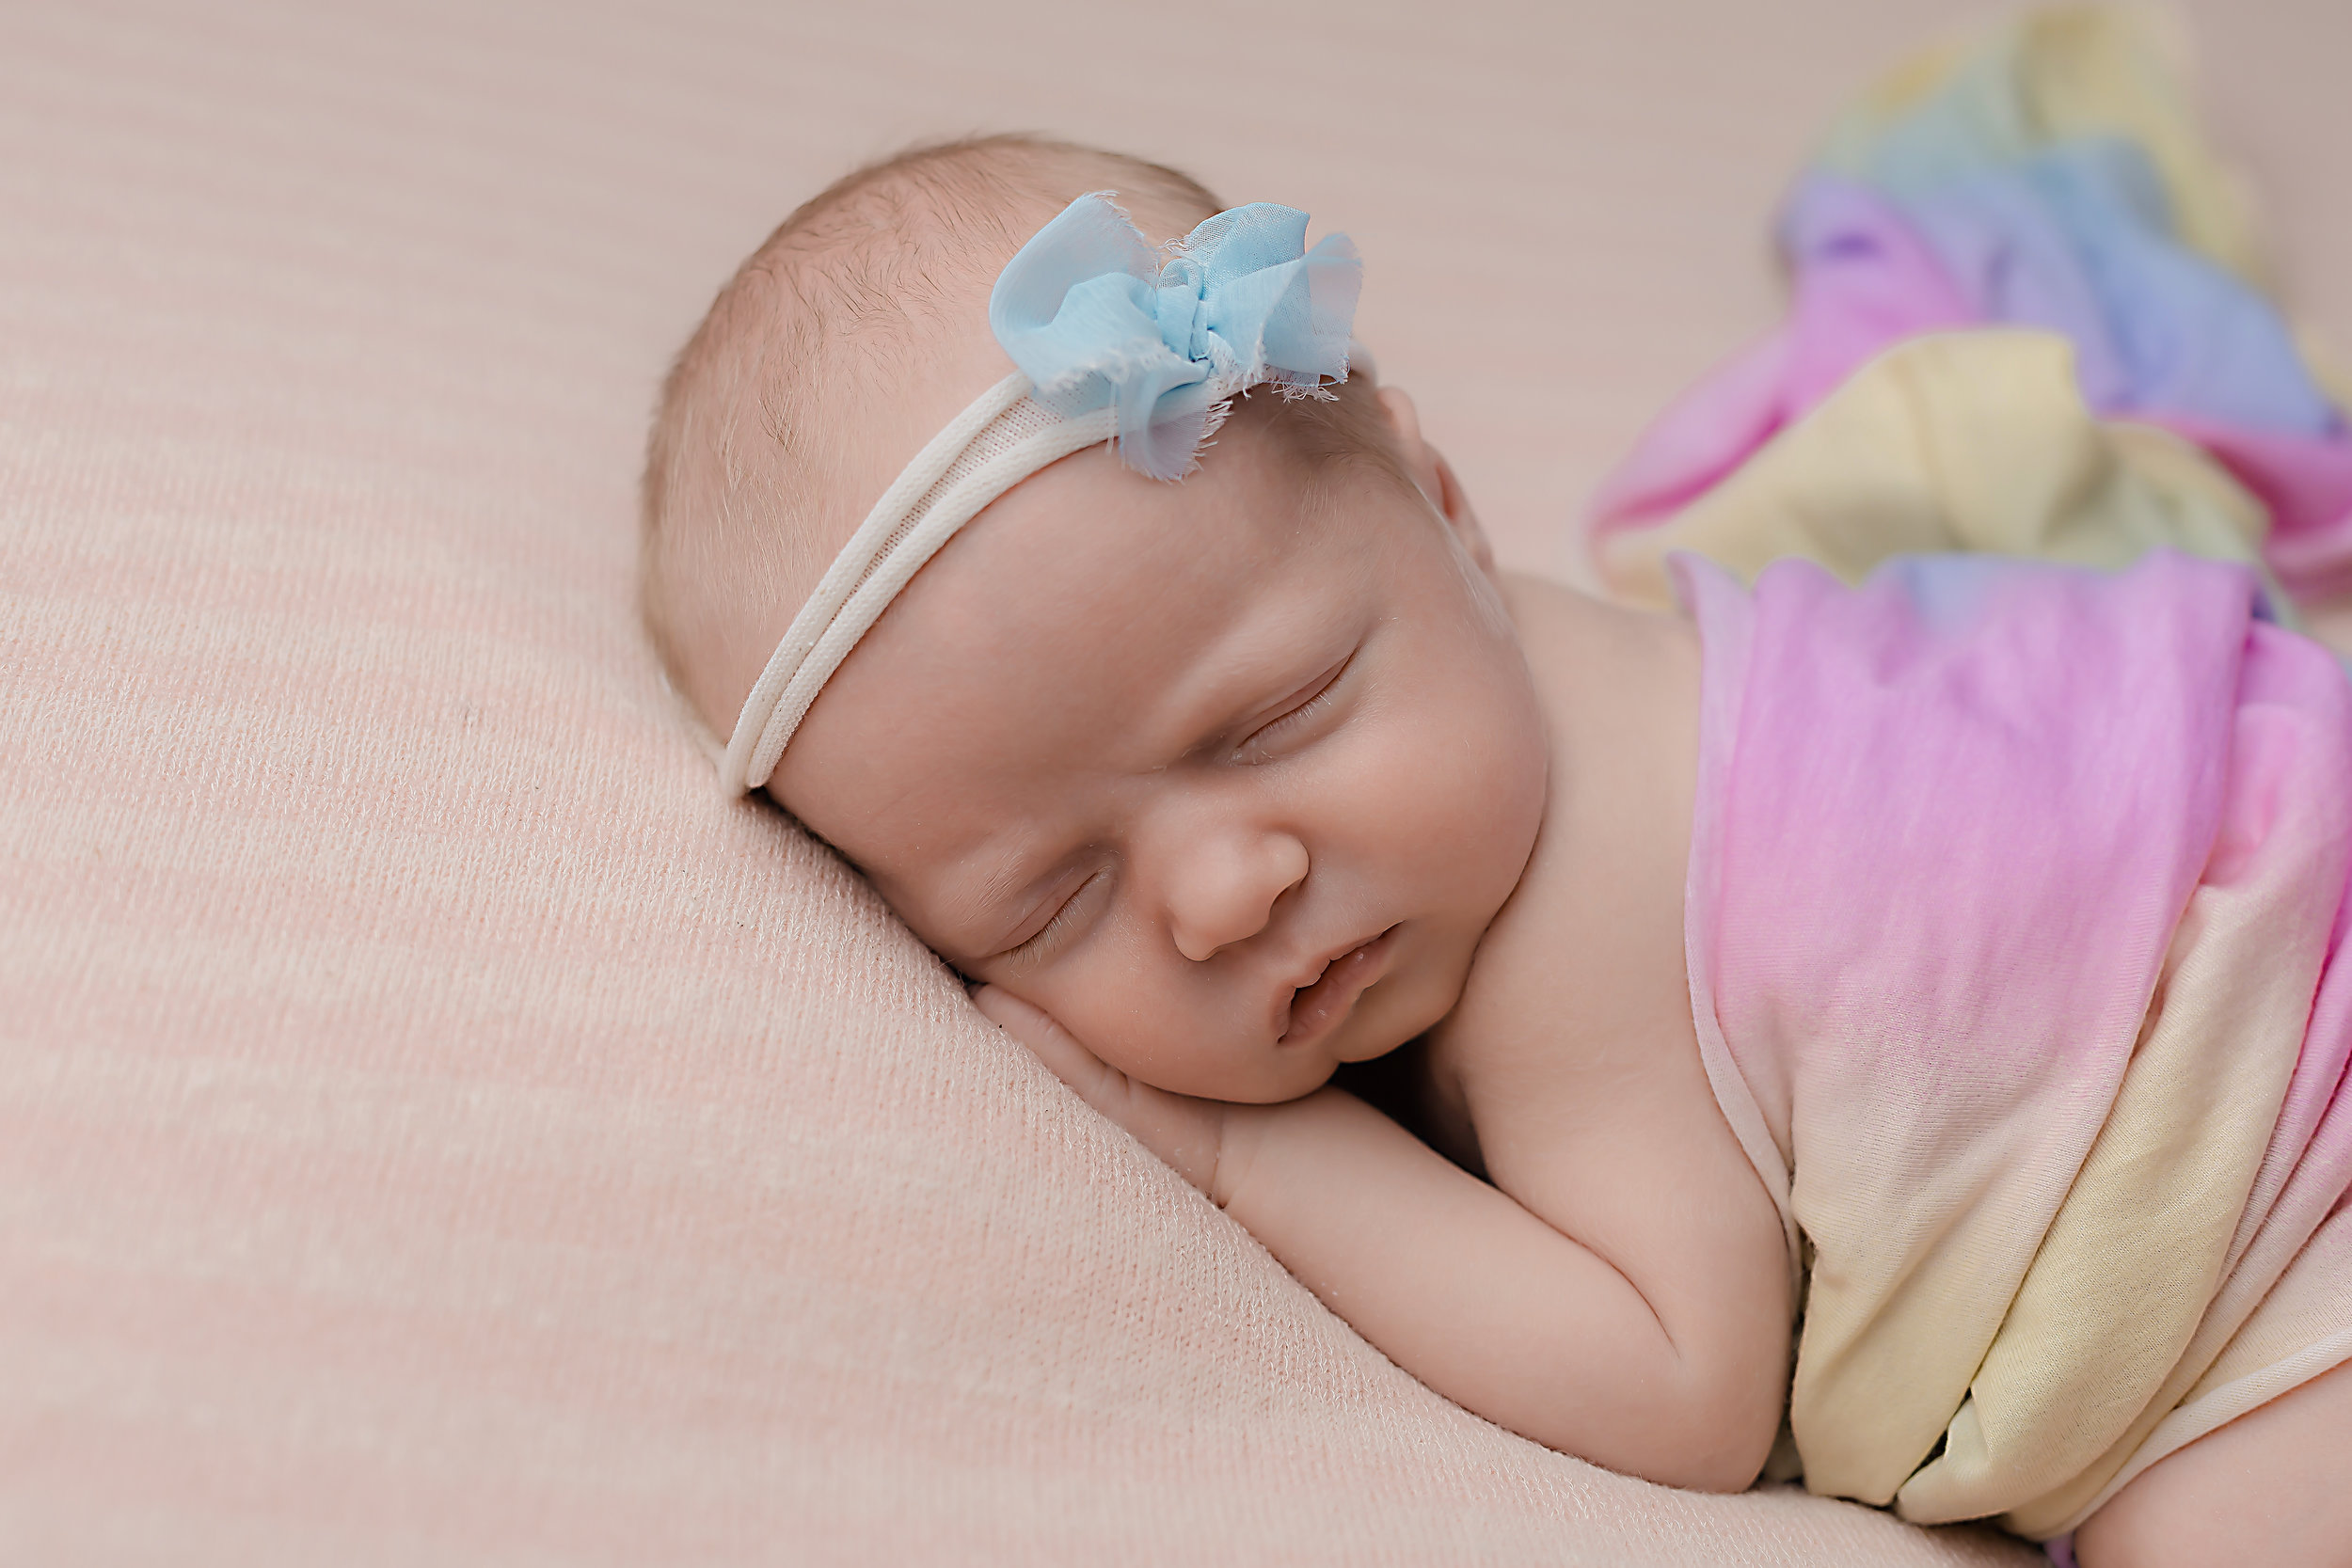 Danirosephotography.newbornphotographeraberdeen.e.jpg